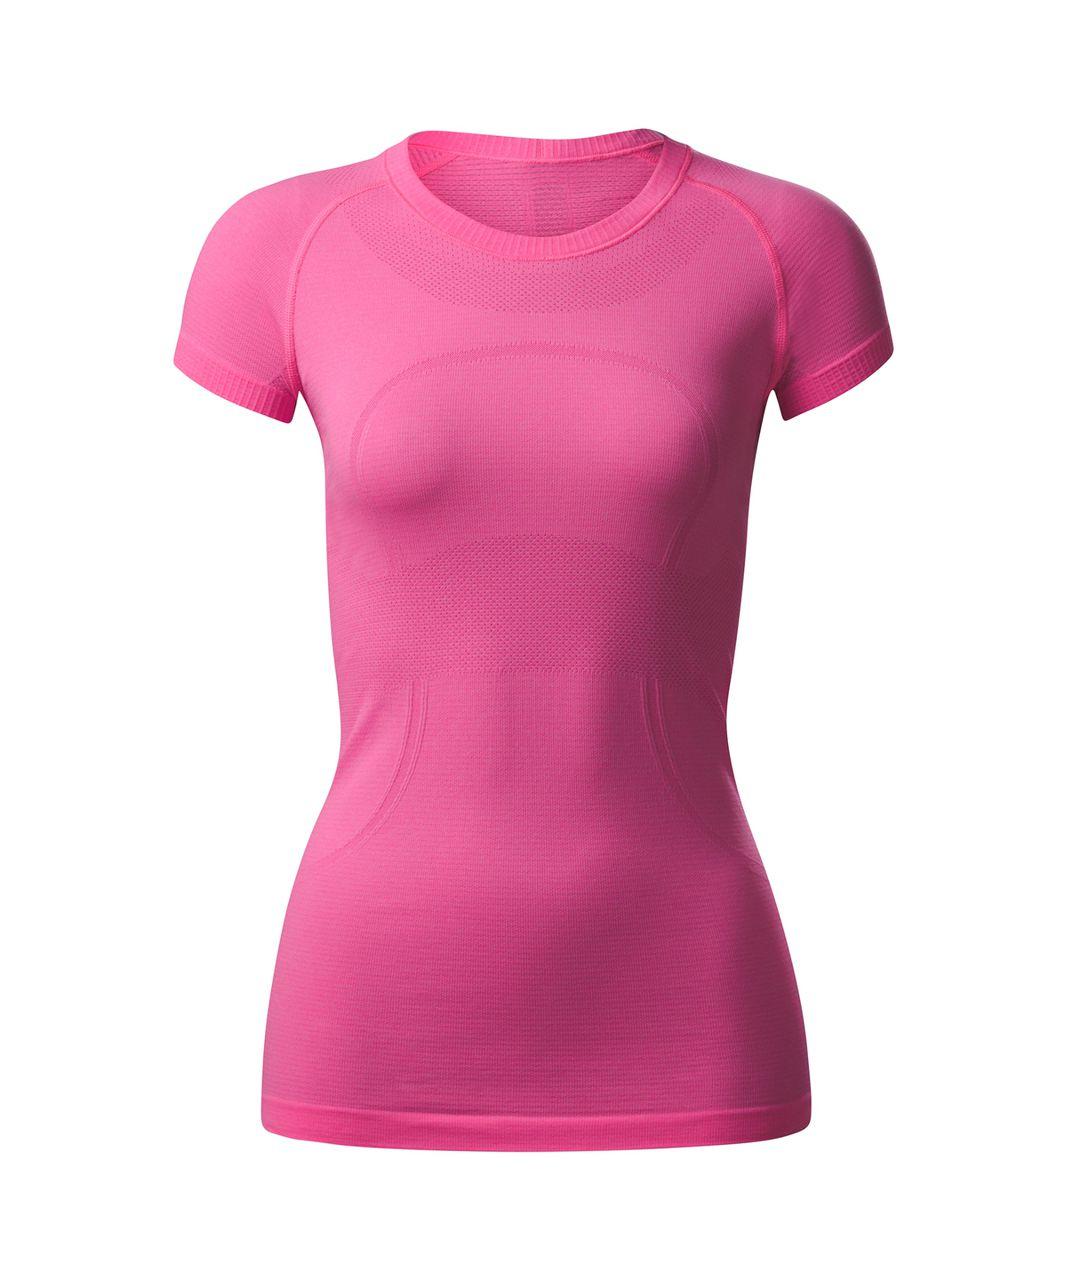 Lululemon Swiftly Tech Short Sleeve Crew - Heathered Neon Pink